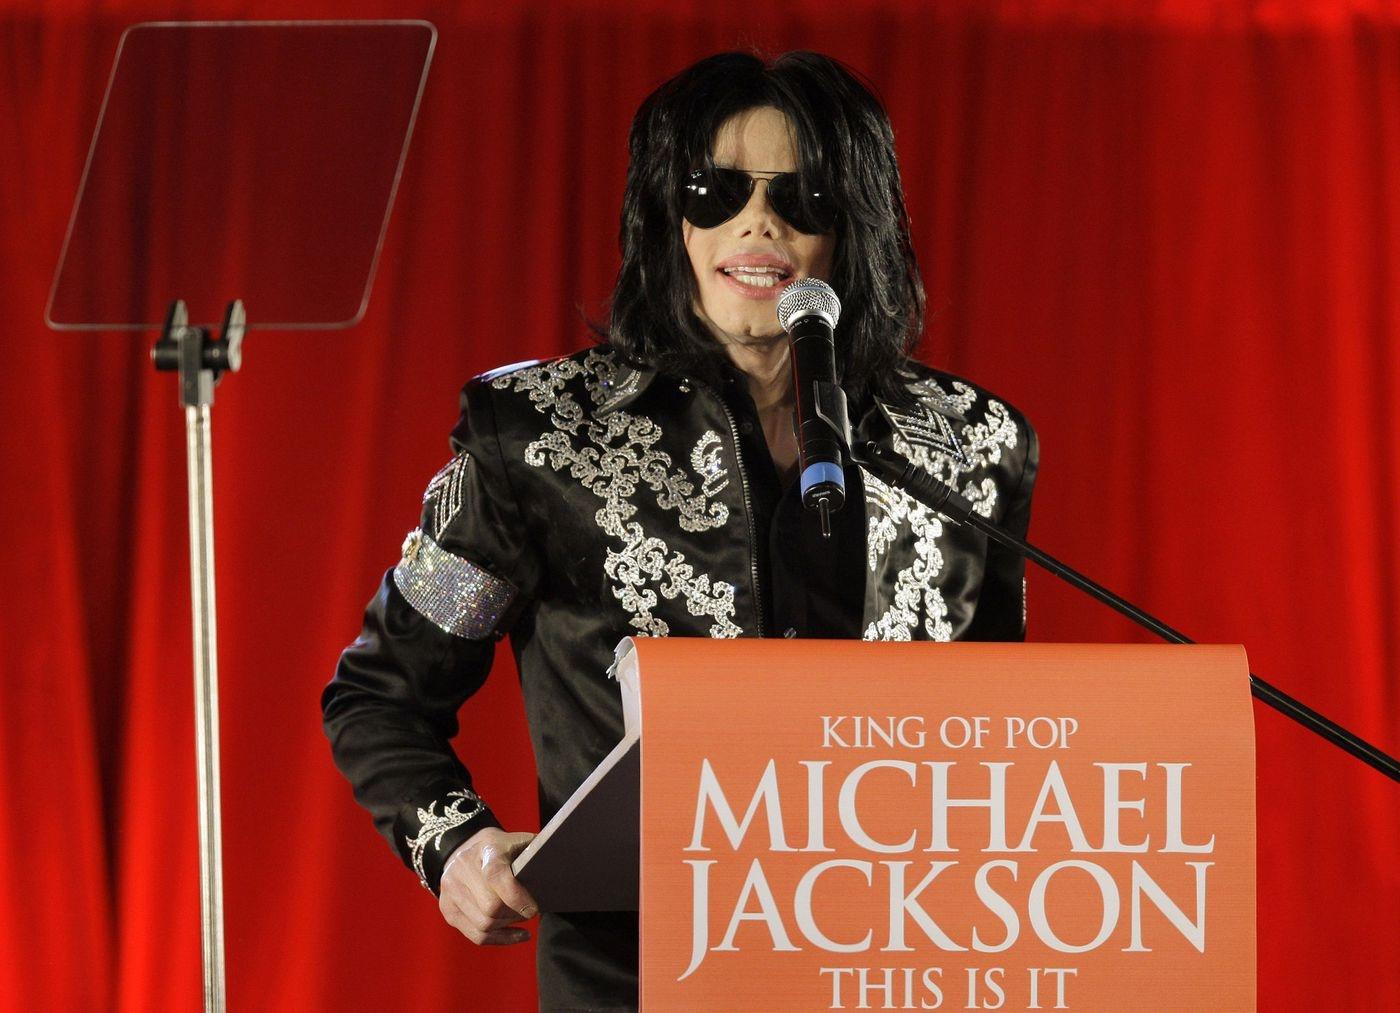 Did Michael Jackson accept Islam? - Quora